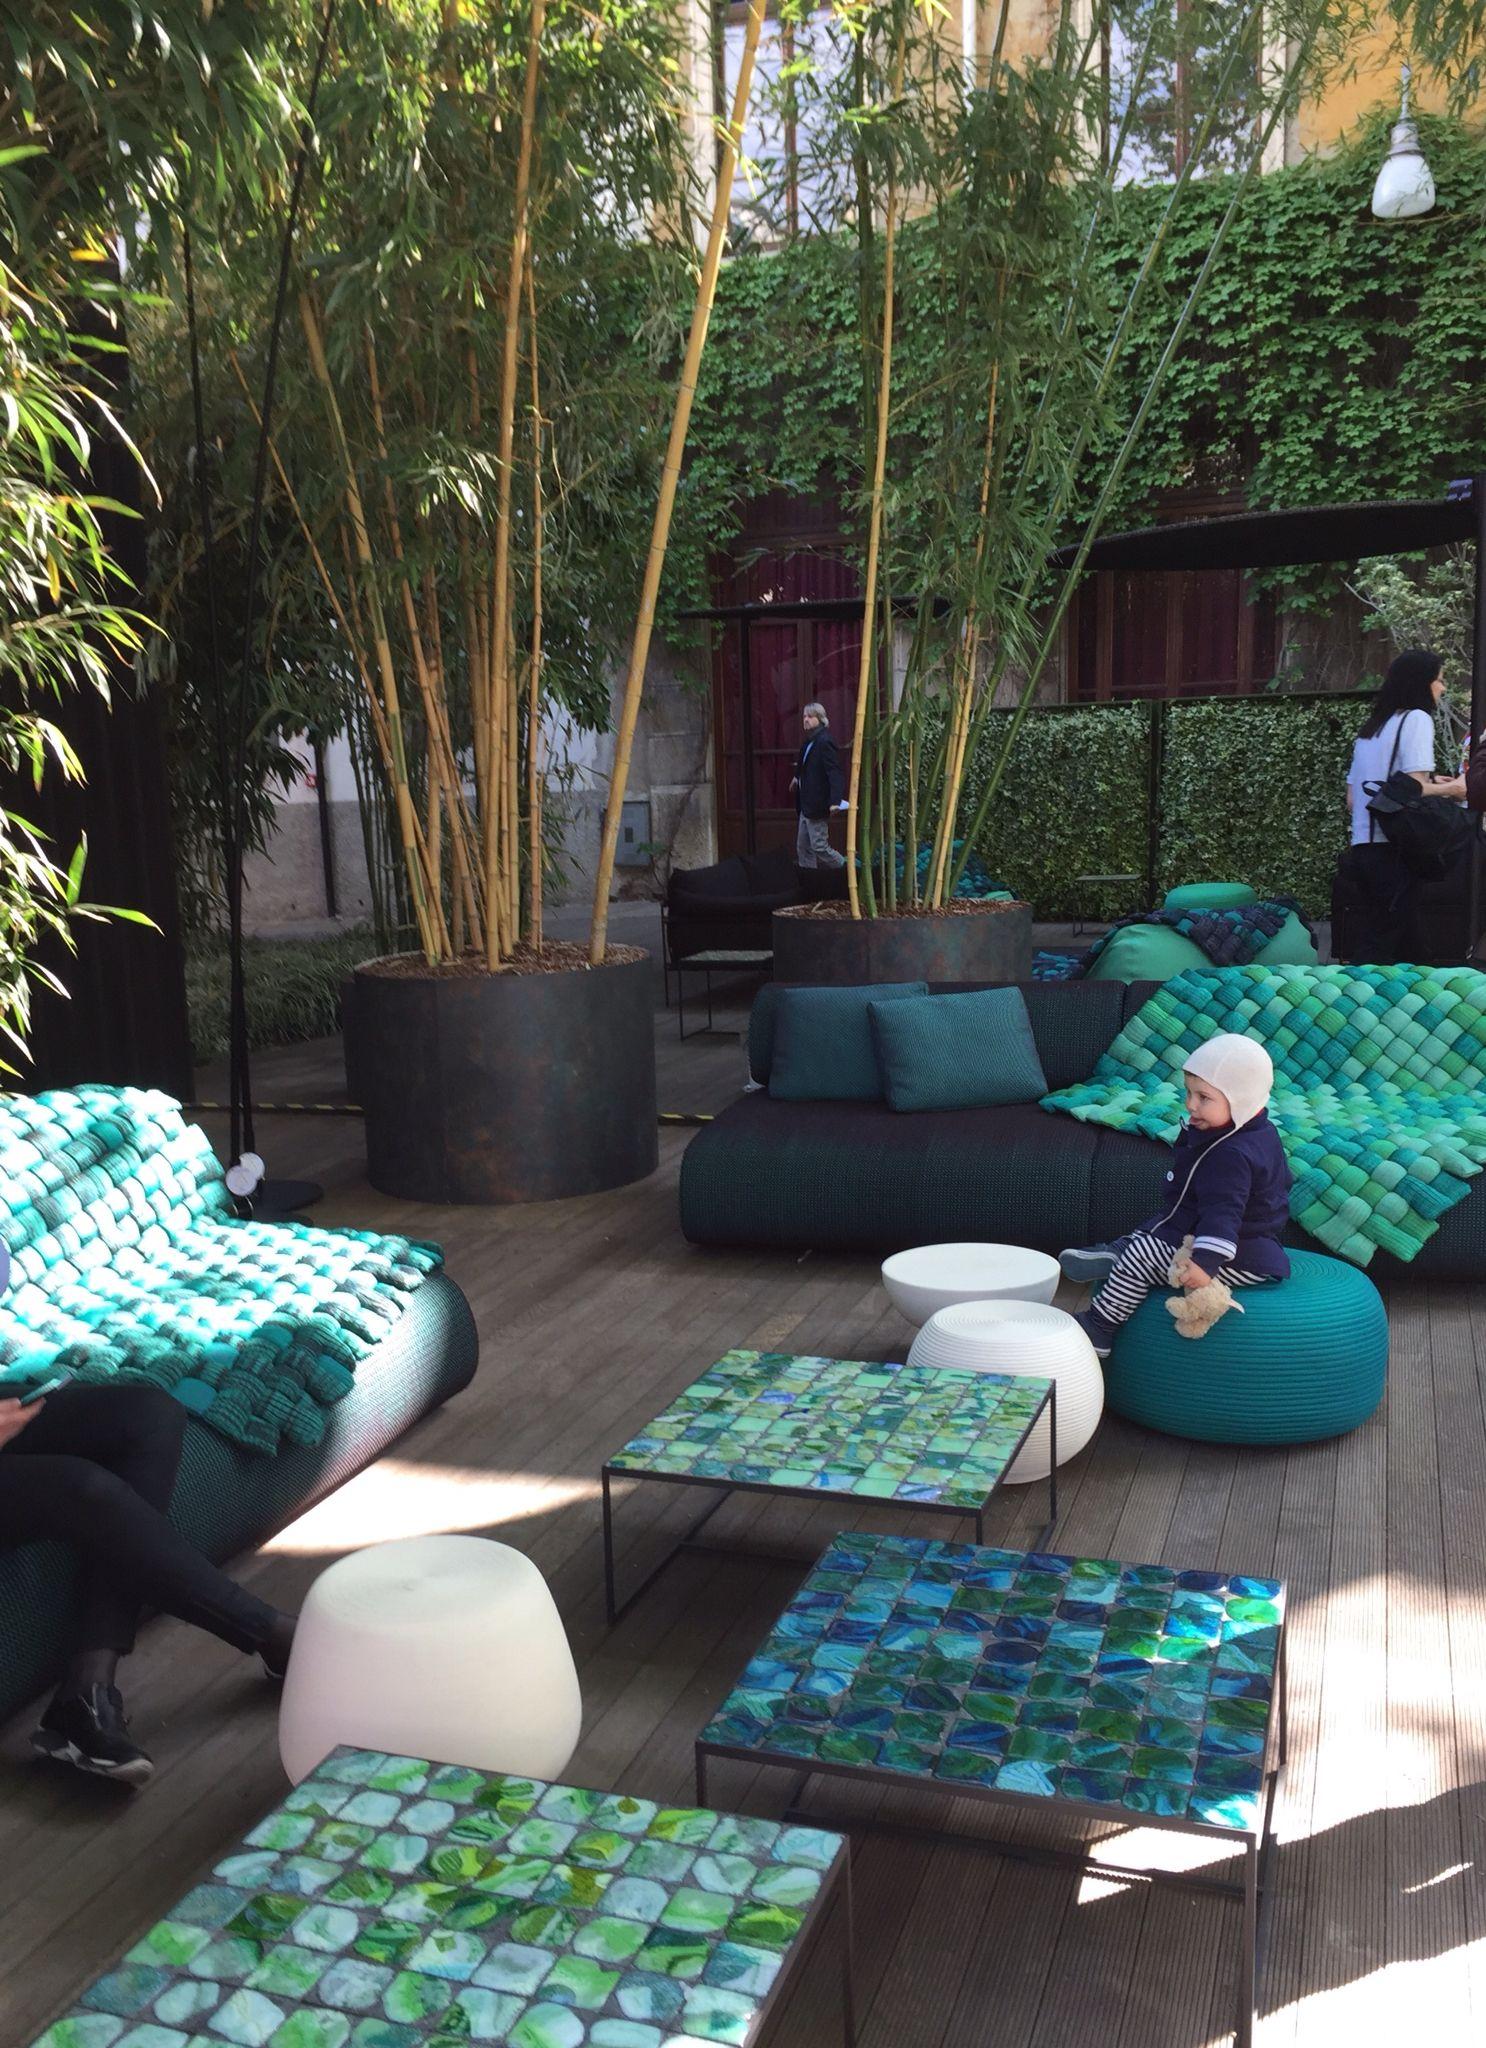 Ola sofa by ramos bassols for paola lenti salone del for Paola lenti